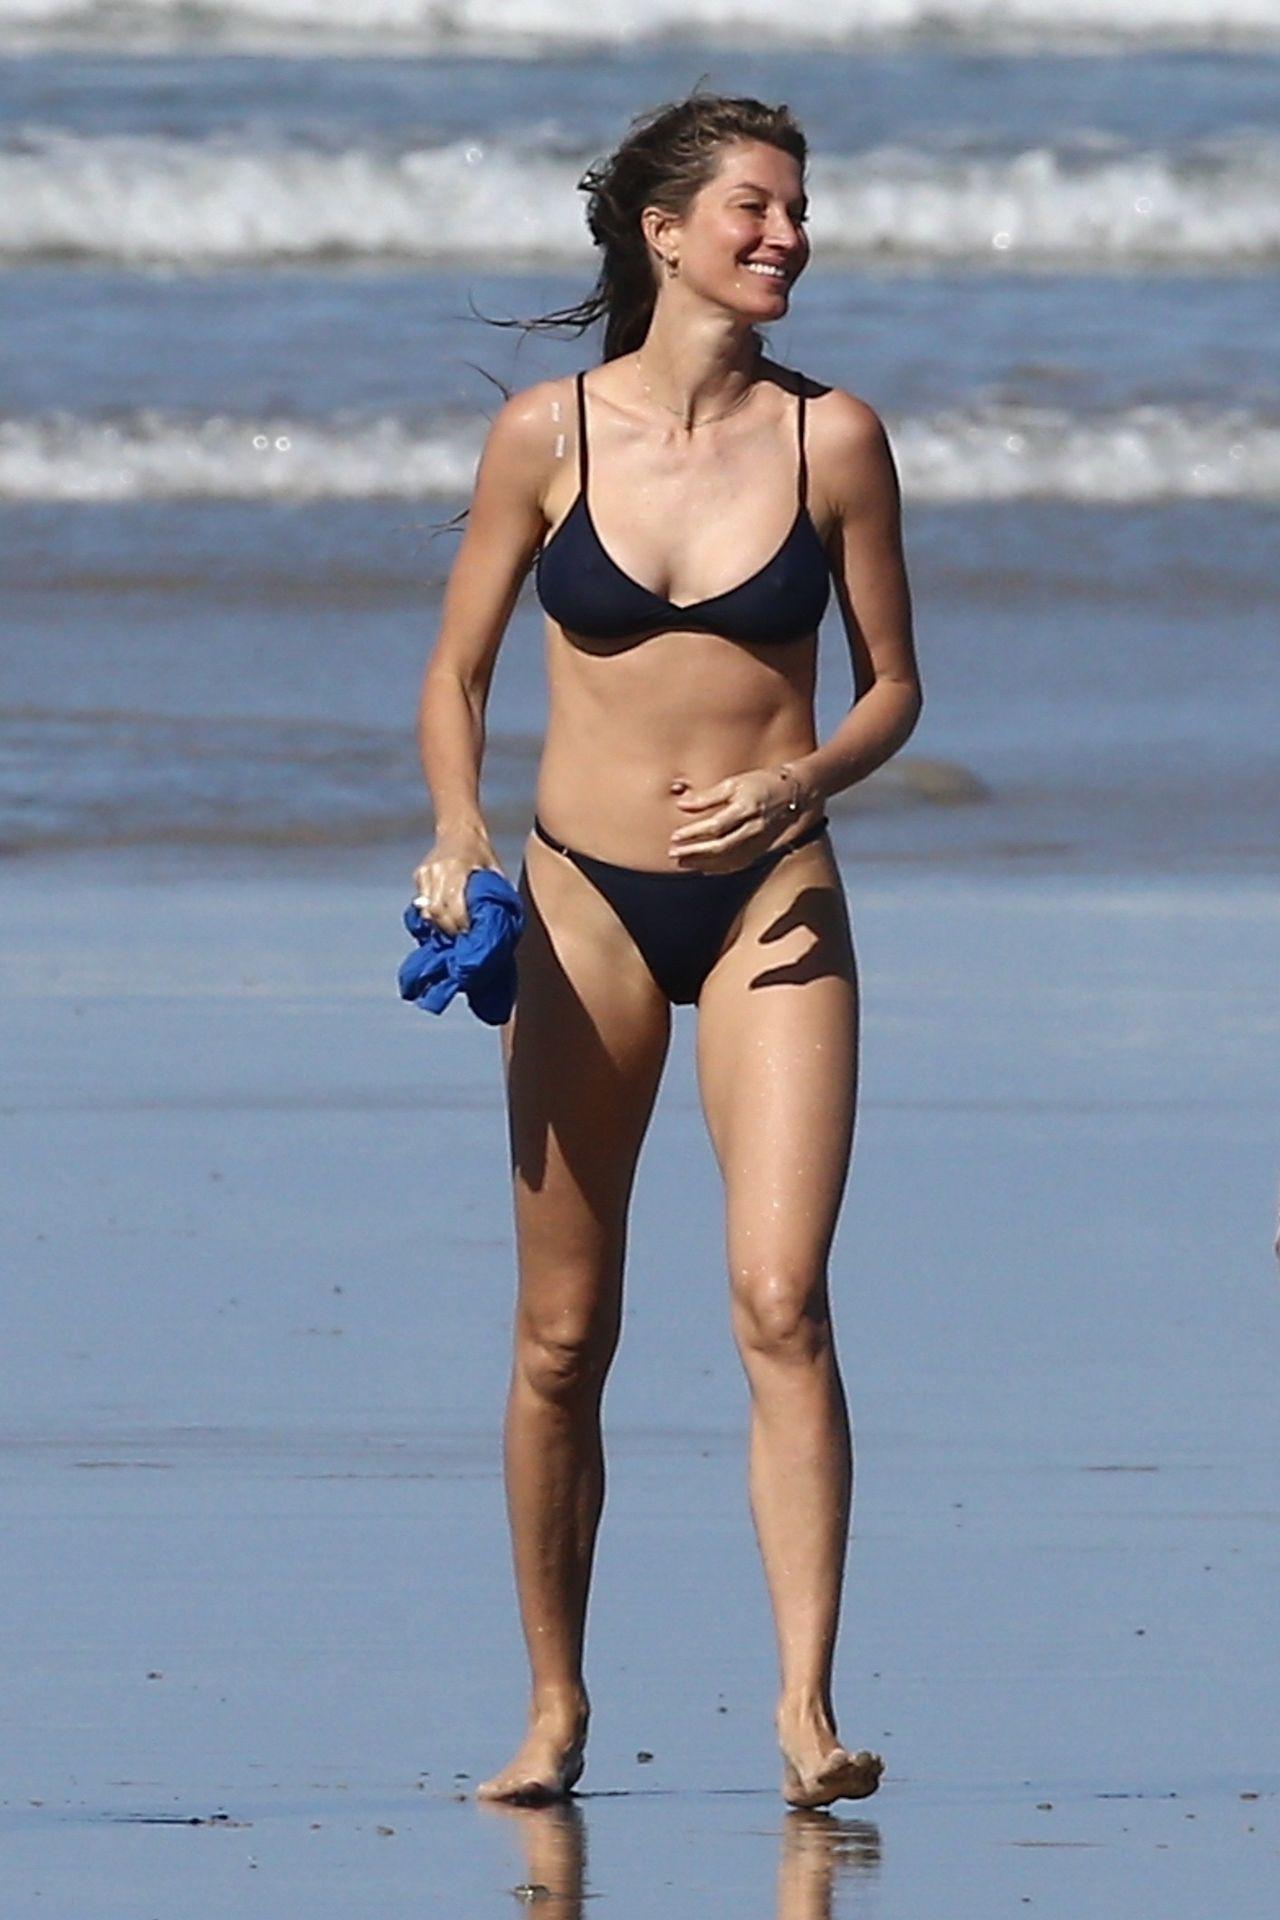 Tom Brady & Gisele Bundchen Pack On The Pda At The Beach 0030